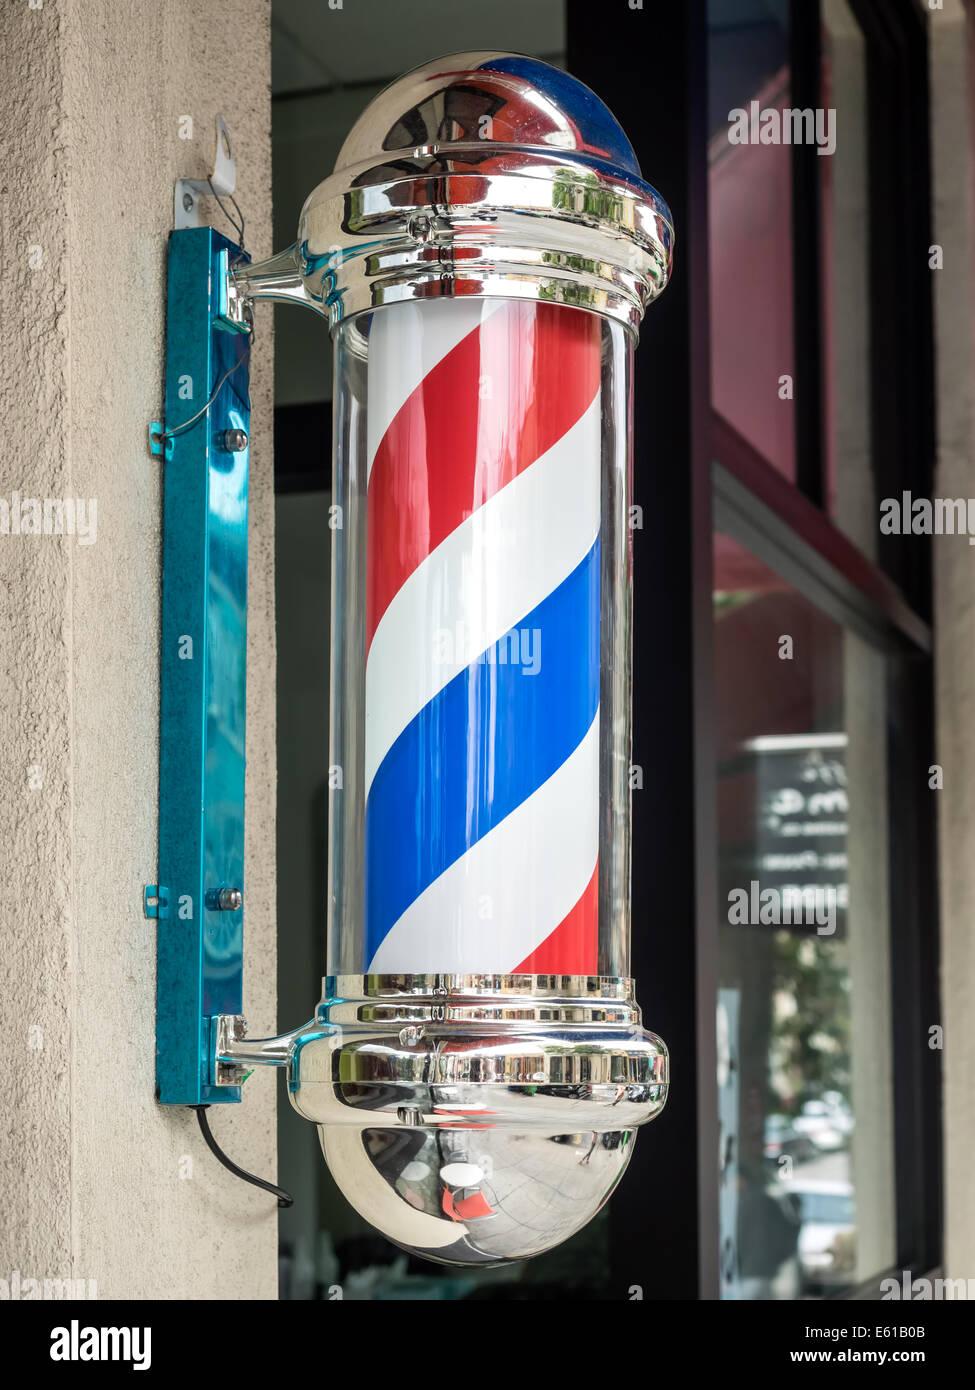 Vintage barber shop sign with rotating stripes - Stock Image